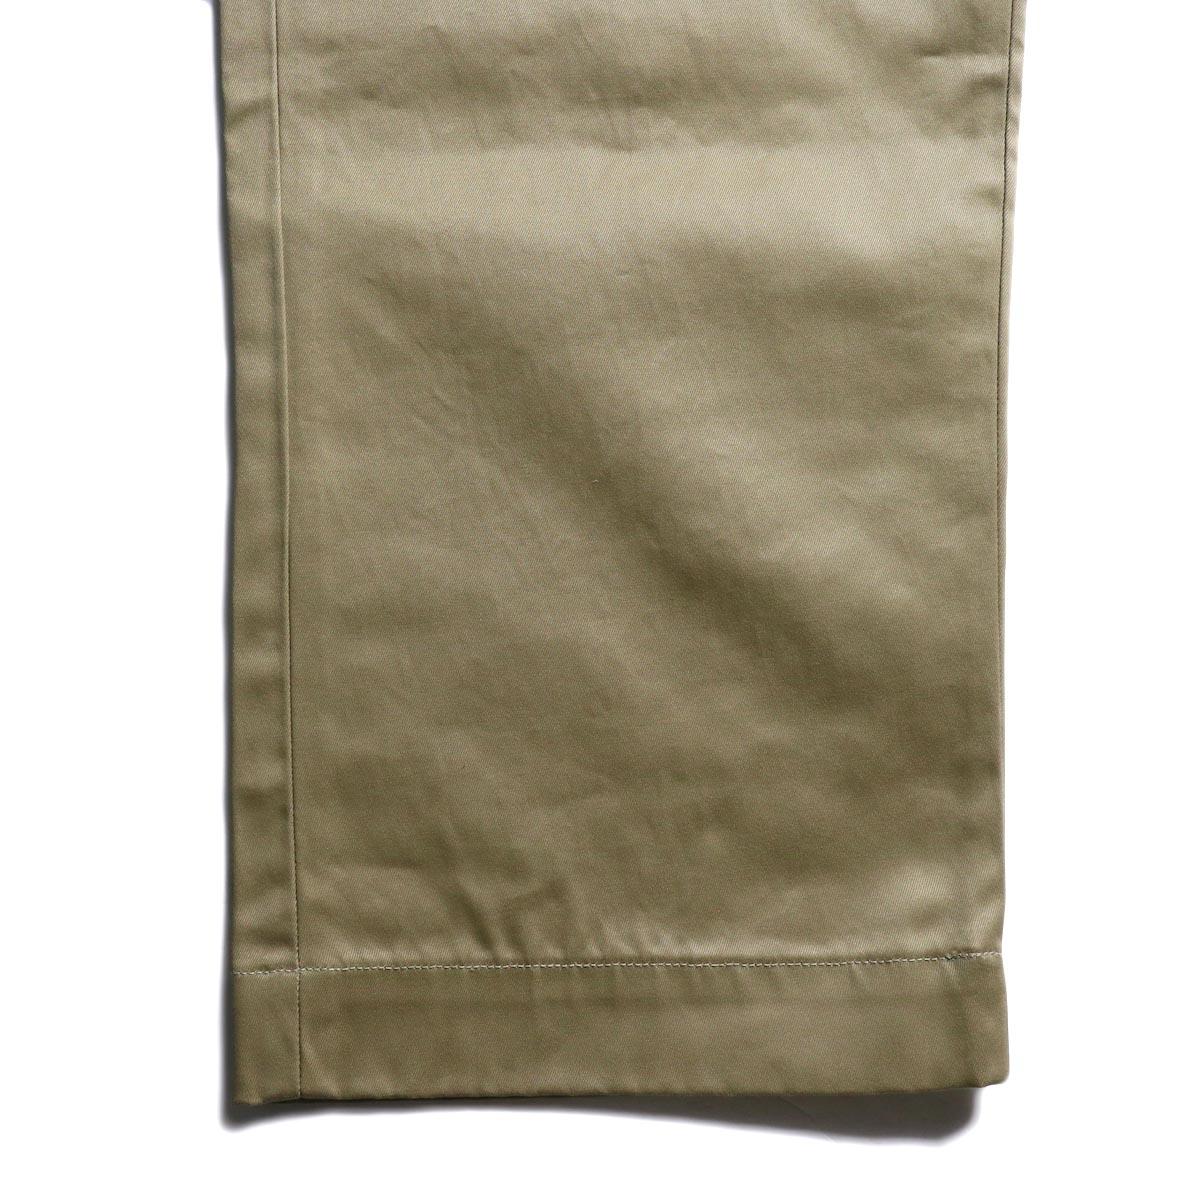 orSlow / VINTAGE FIT ARMY TROUSERS (Khaki)裾